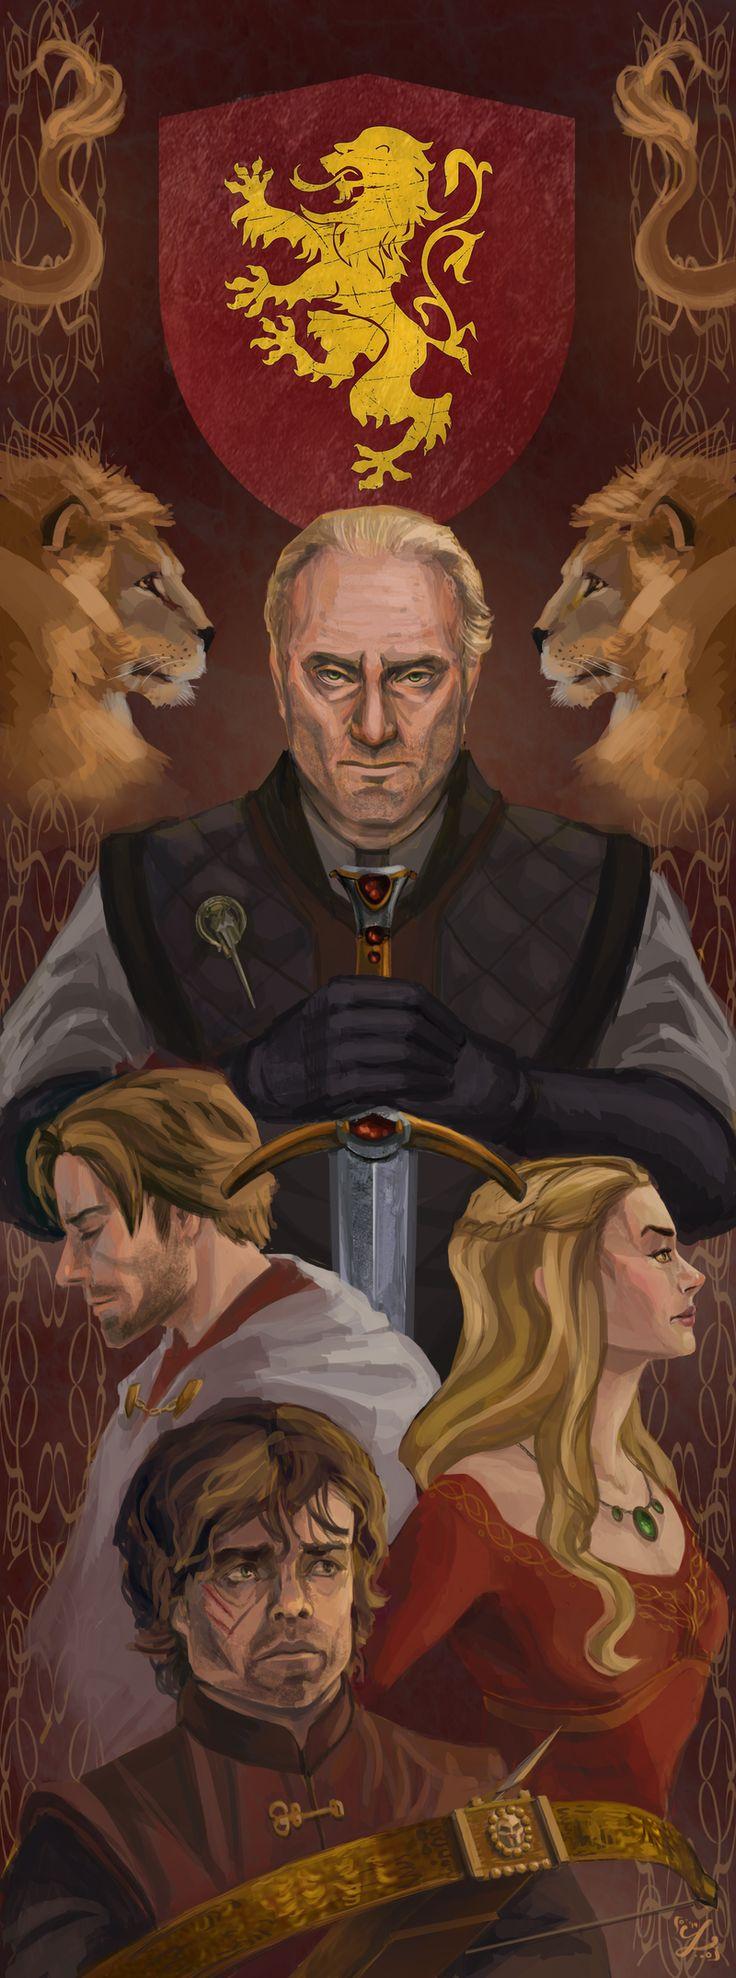 House Lannister by Alsheim.deviantart.com on @deviantART